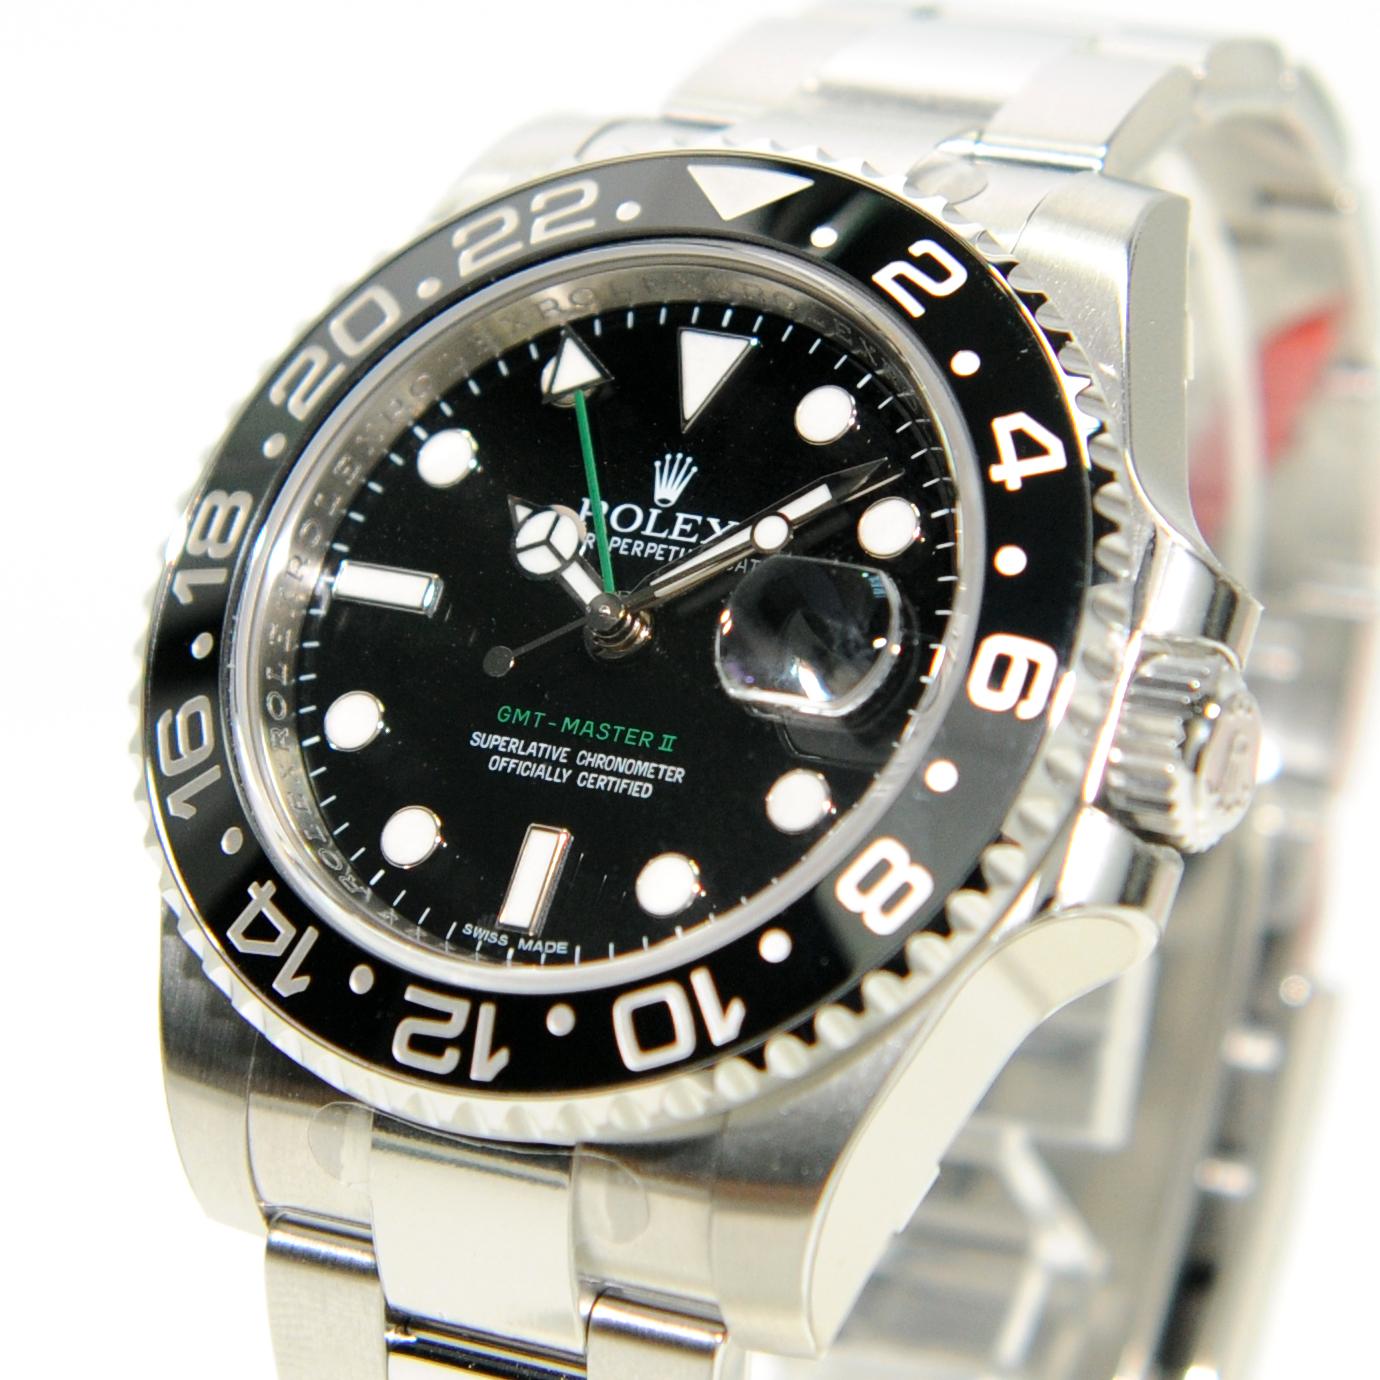 VOGUE STATION 的時尚誌: ROLEX 116710LN 綠針 GMT MASTER II